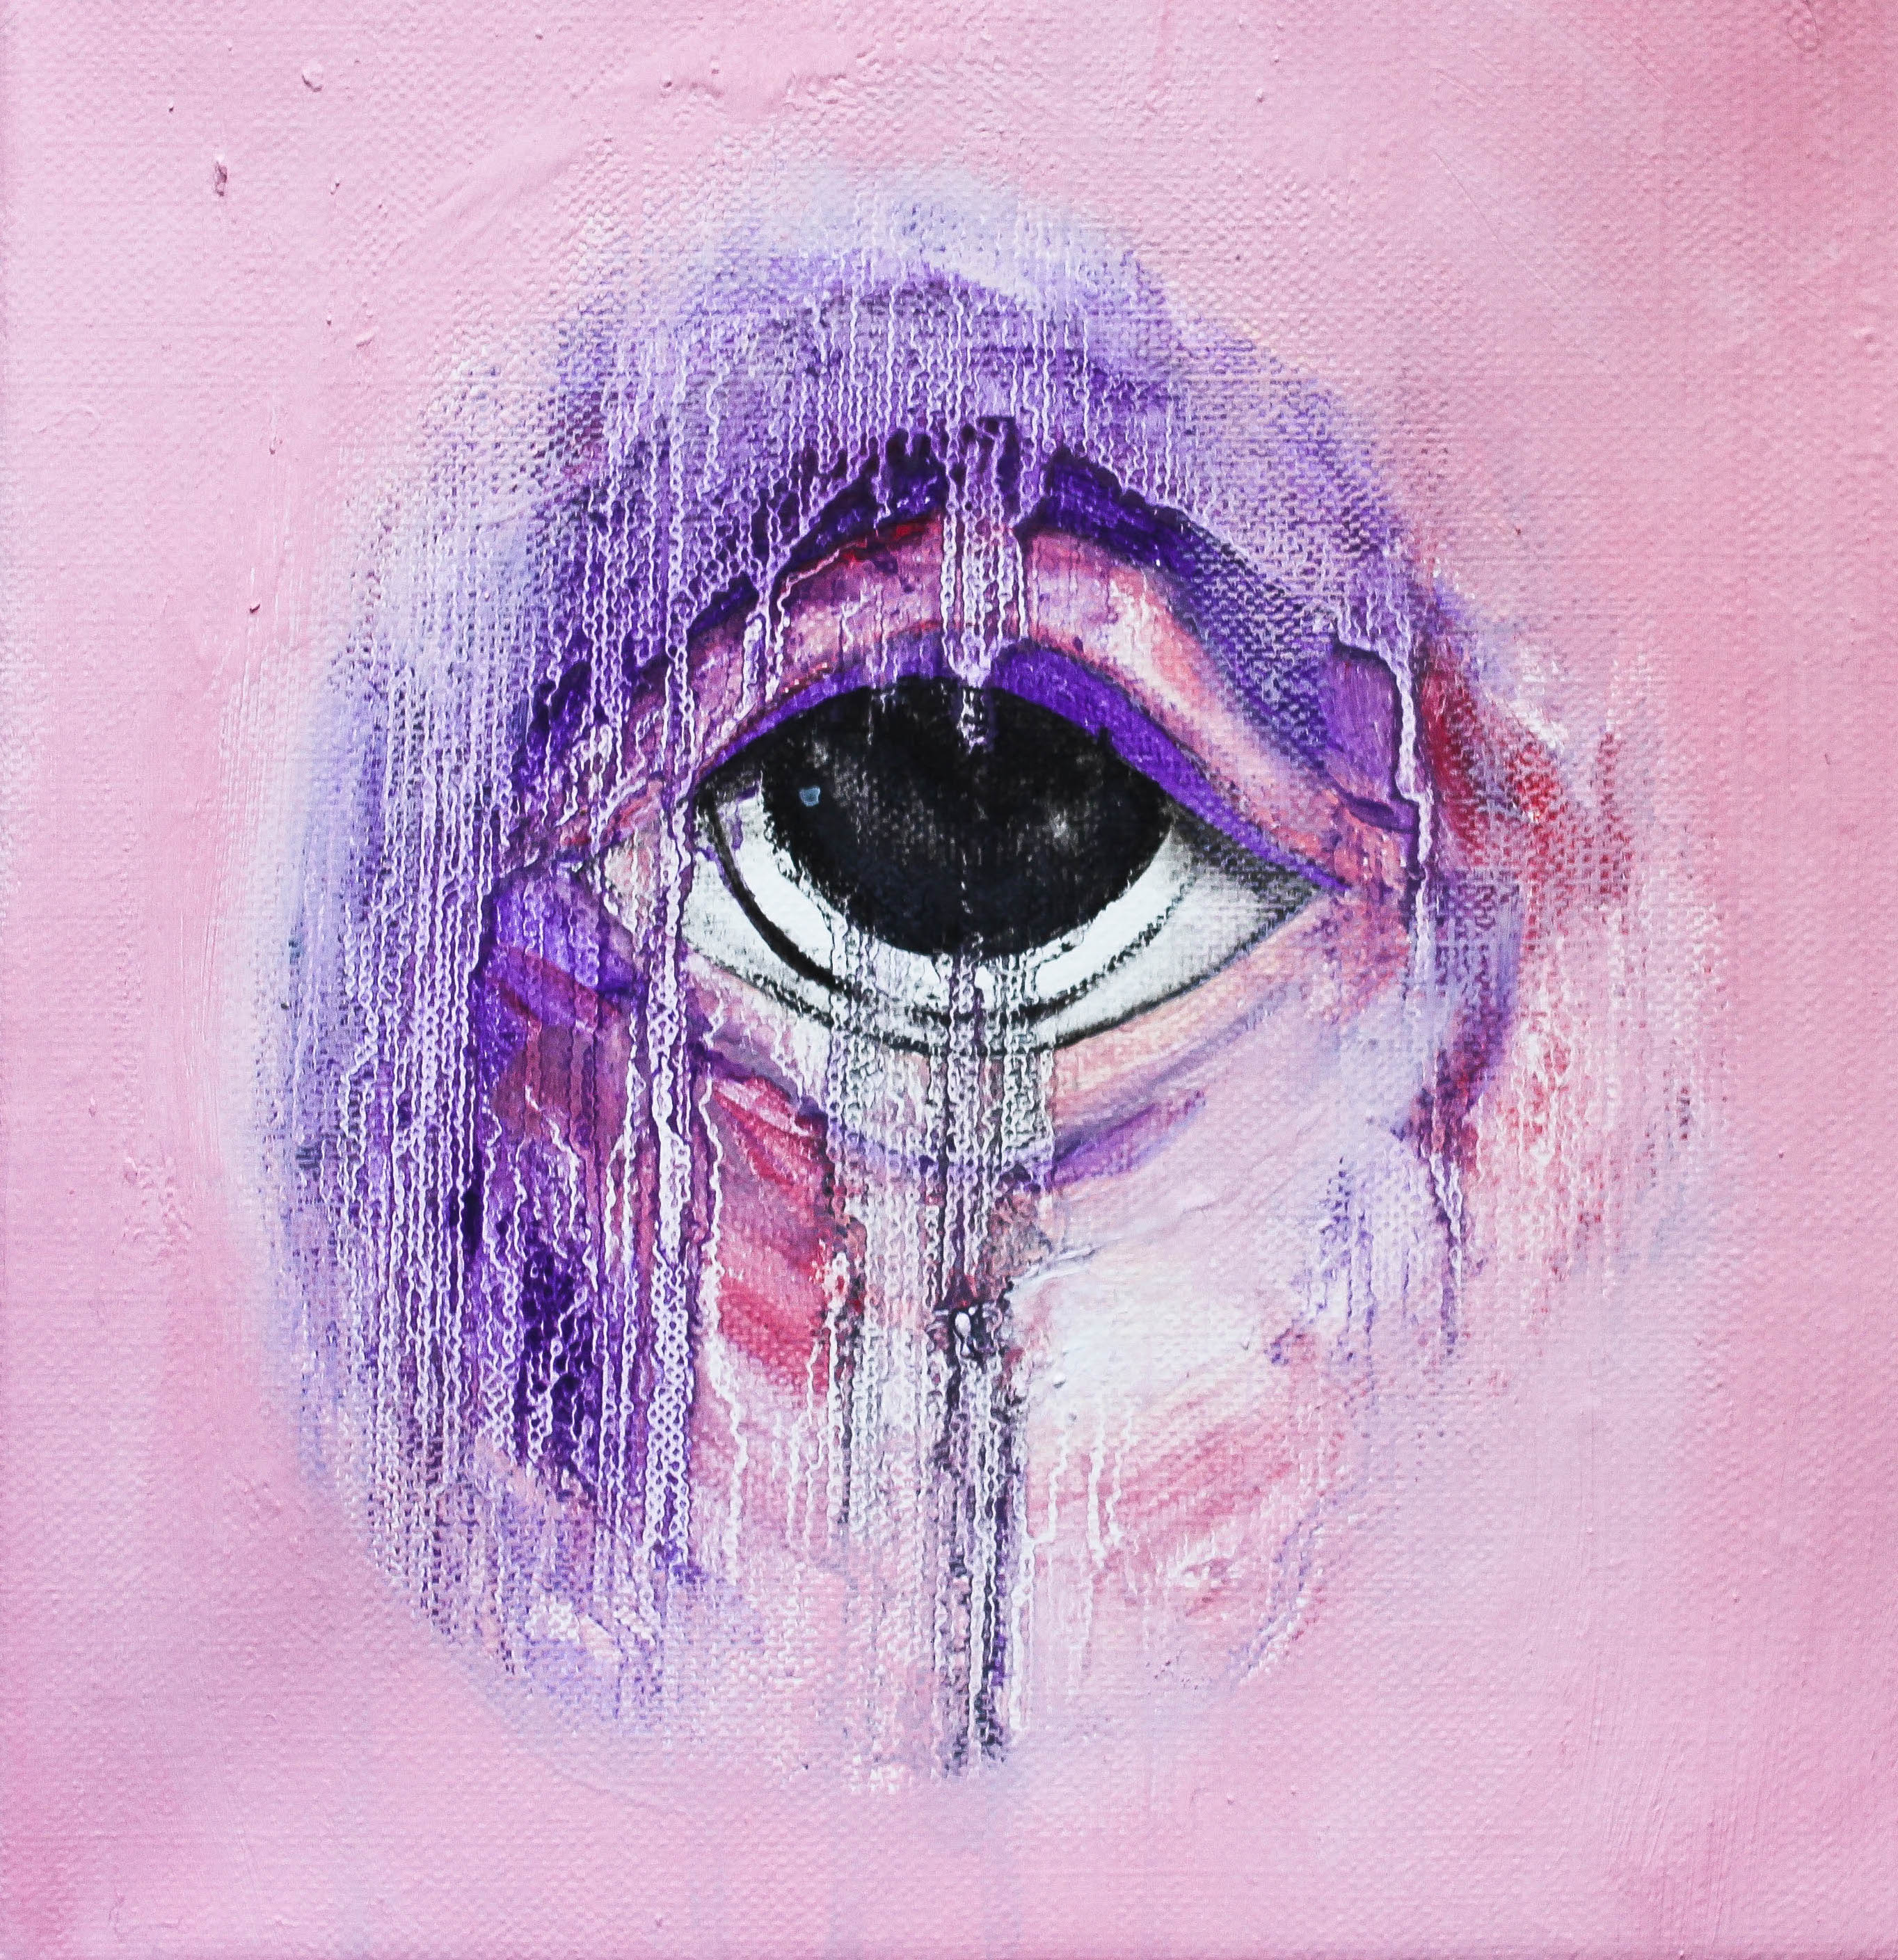 Eyes #1 by Hugo Baudouin